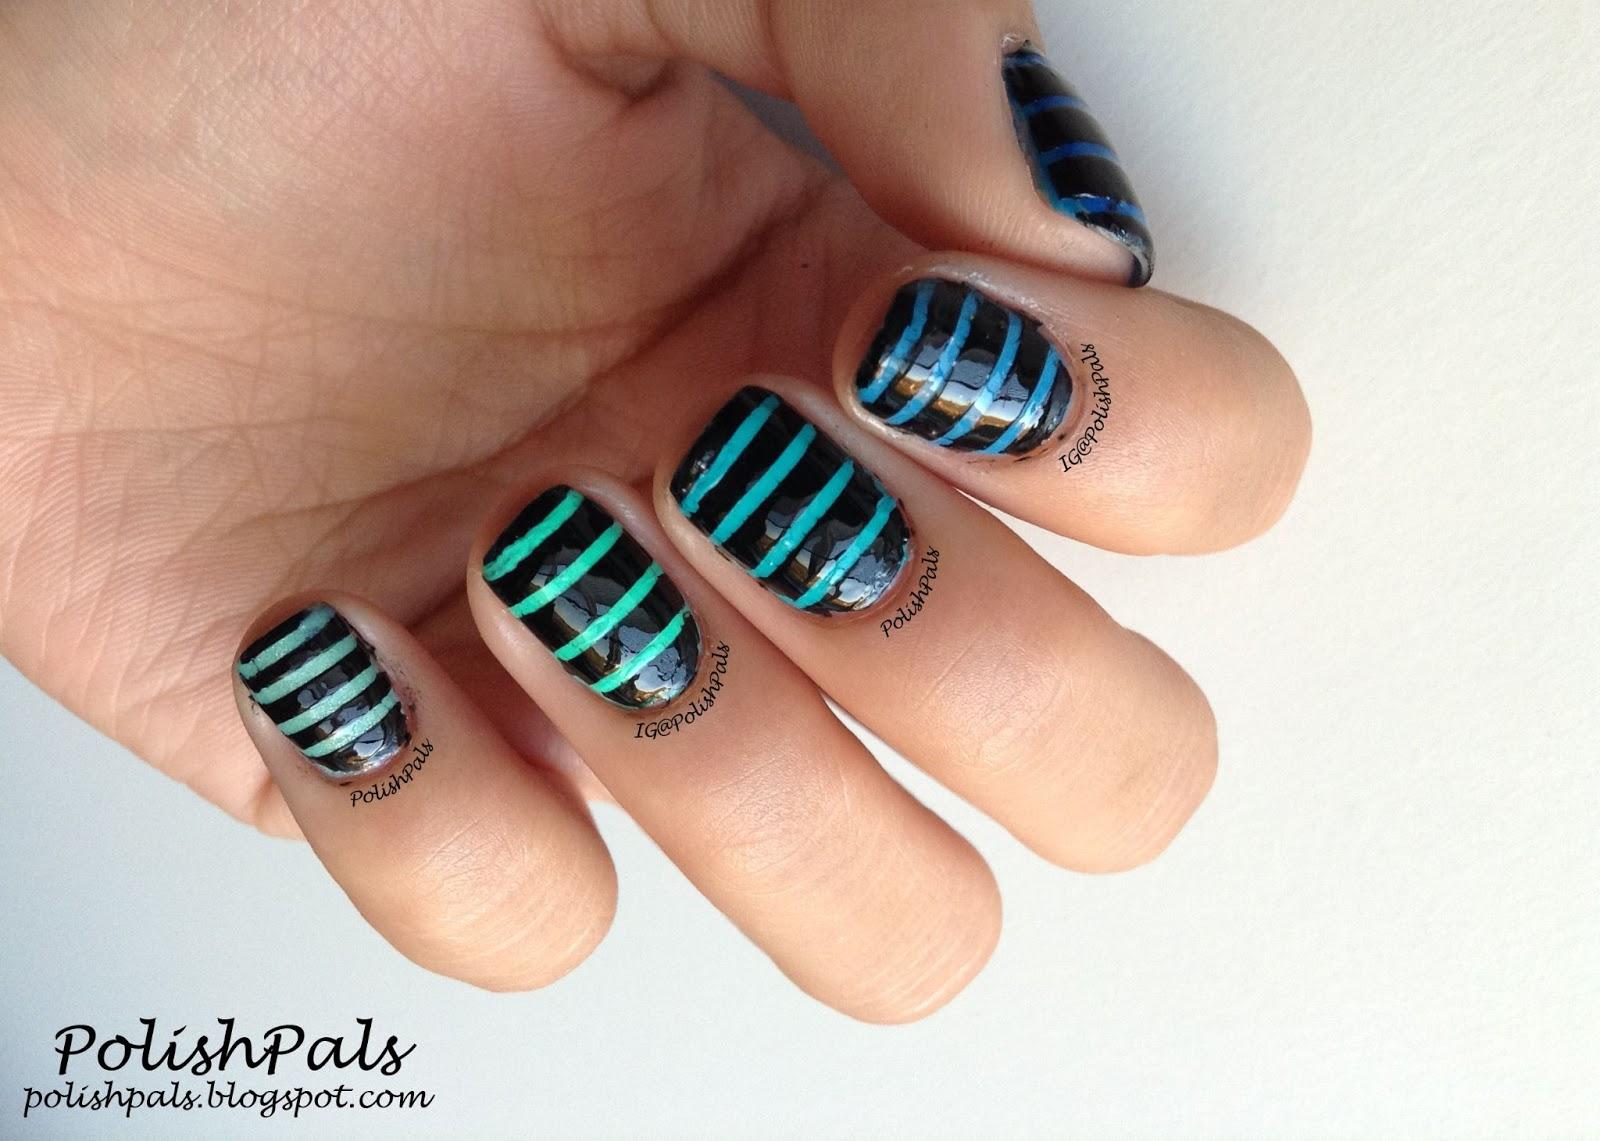 Polish Pals: Ombre Stripes